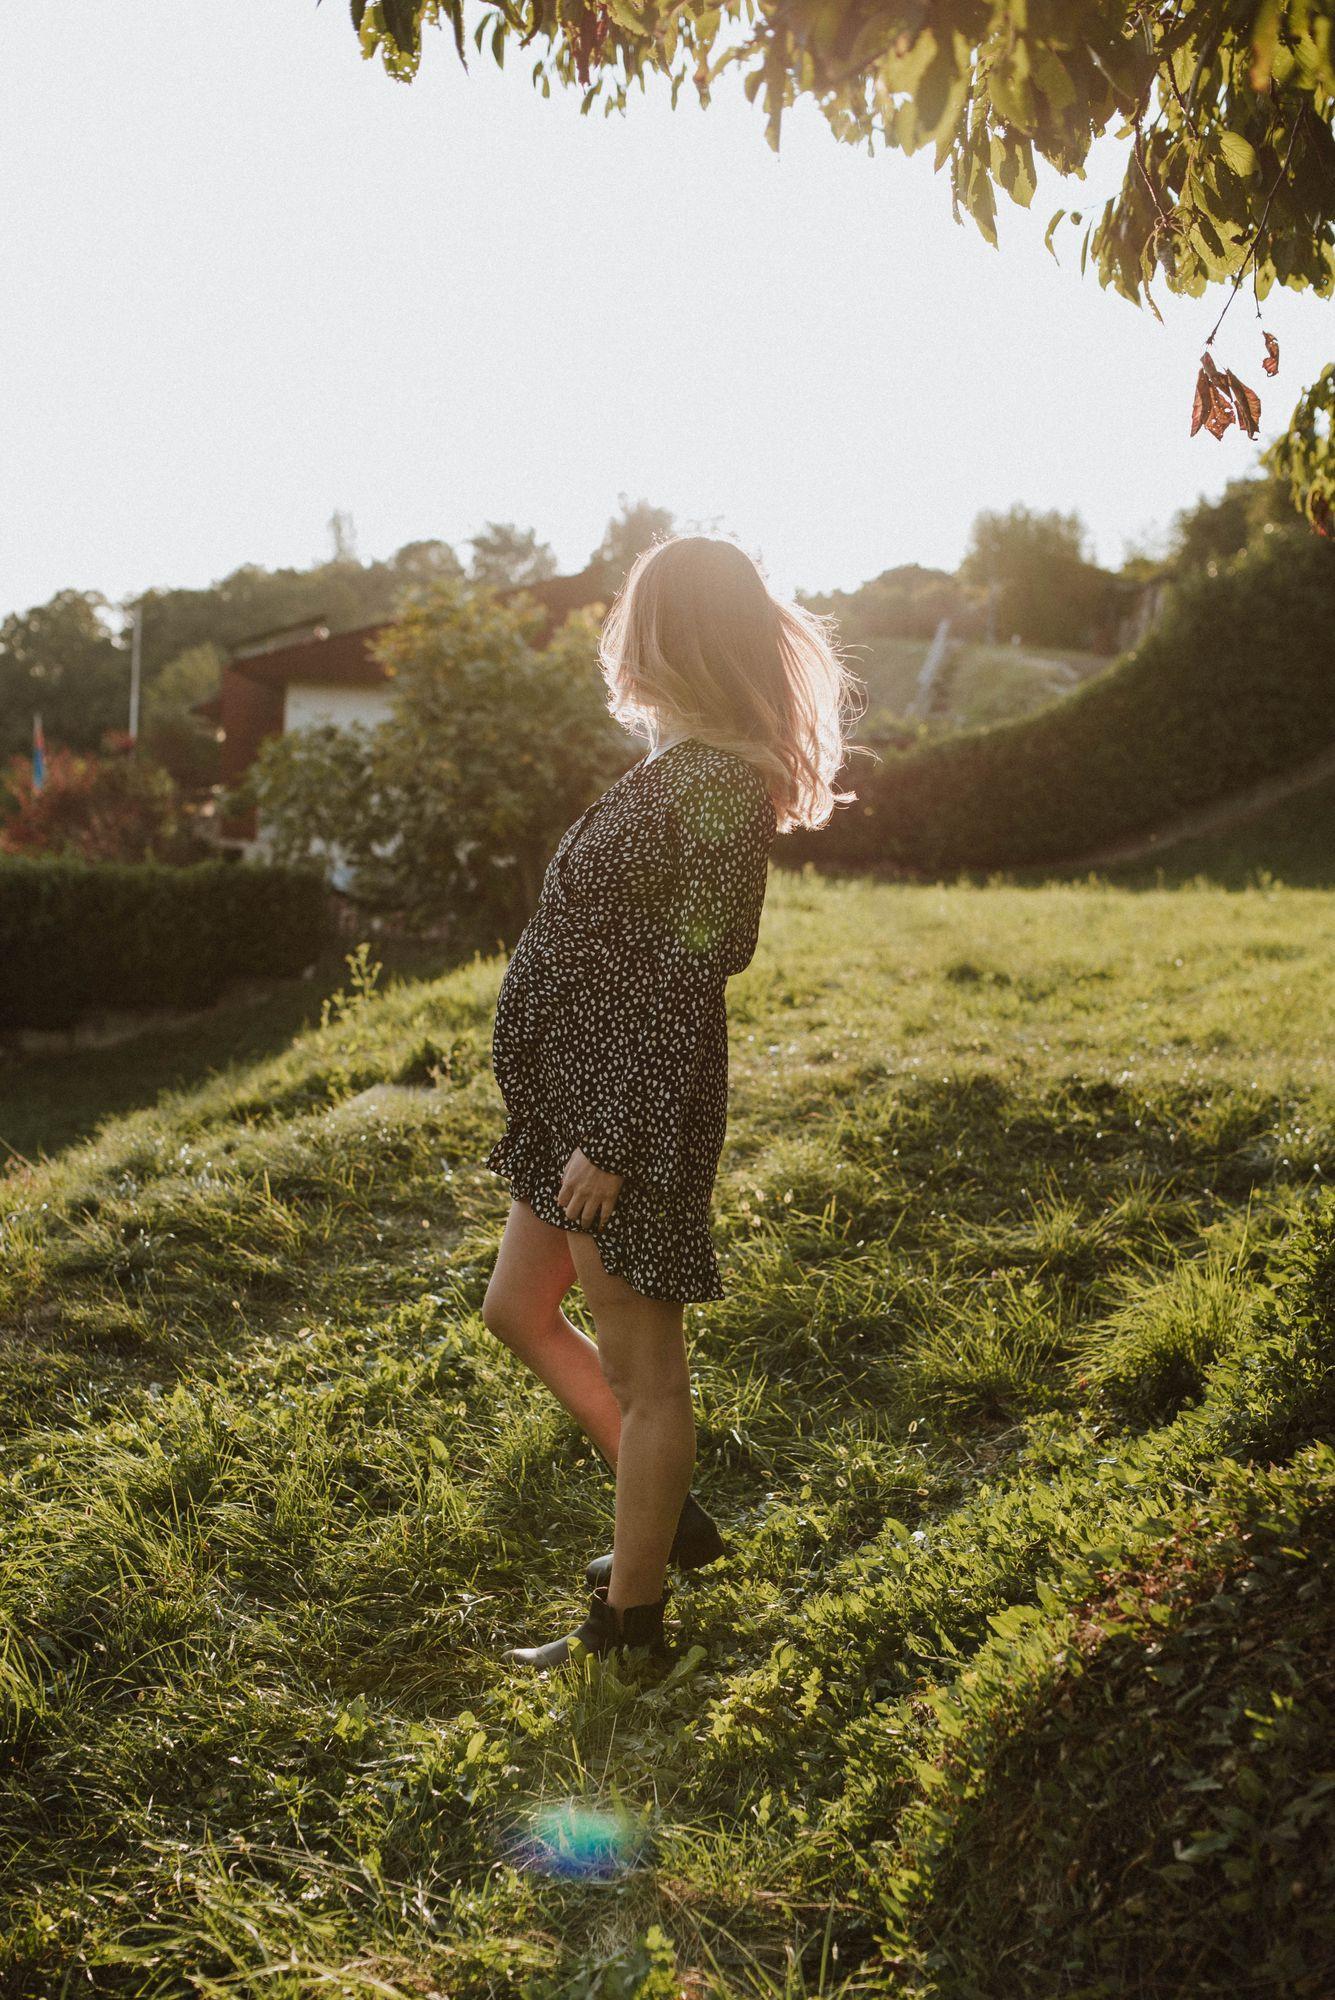 Fotografo maternita' Lugano (34).jpg